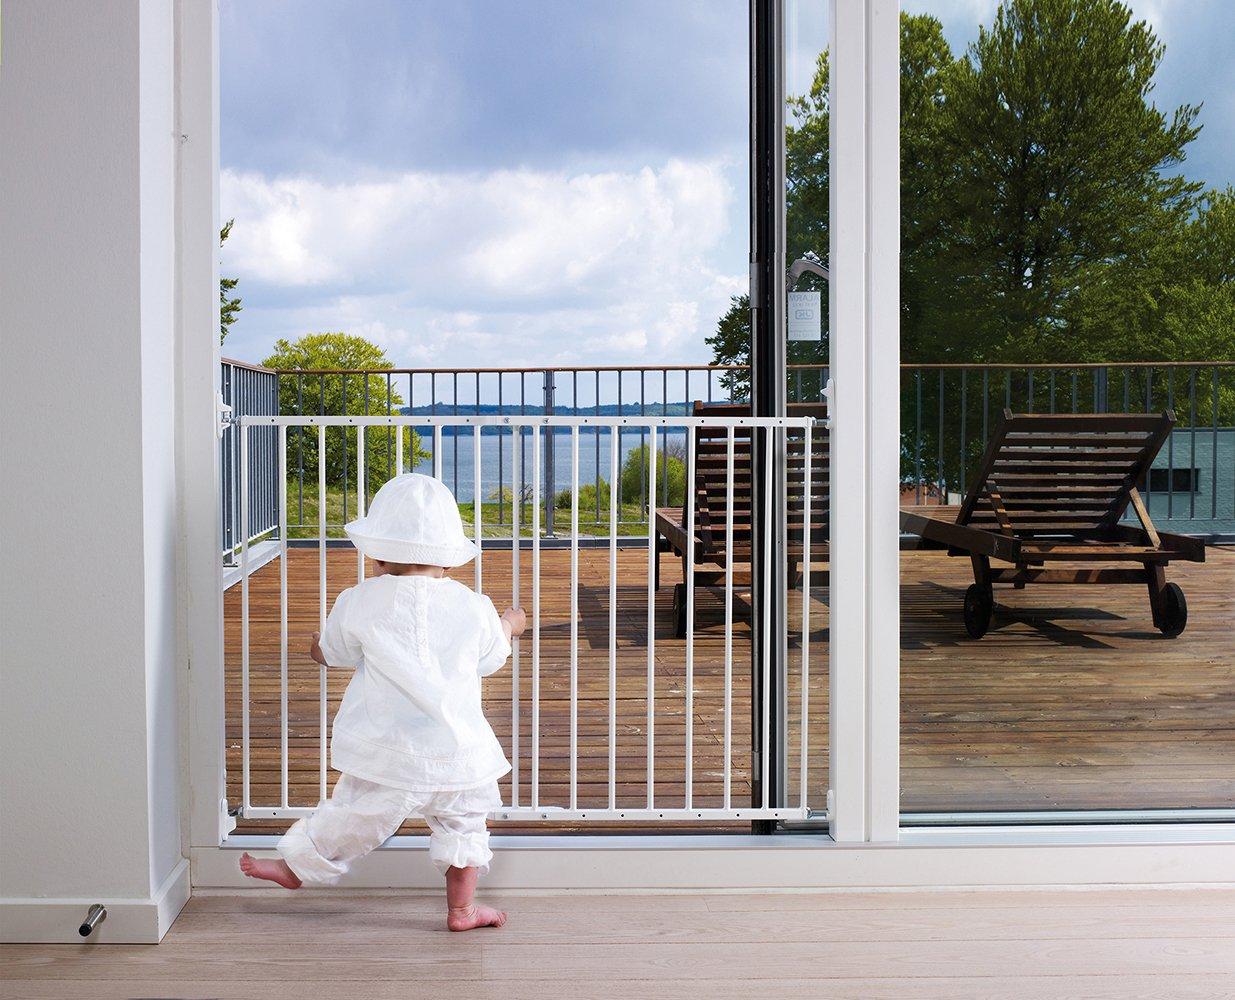 BabyDan Multidan Extending Metal Safety Gate, White: Amazon.co.uk: Baby